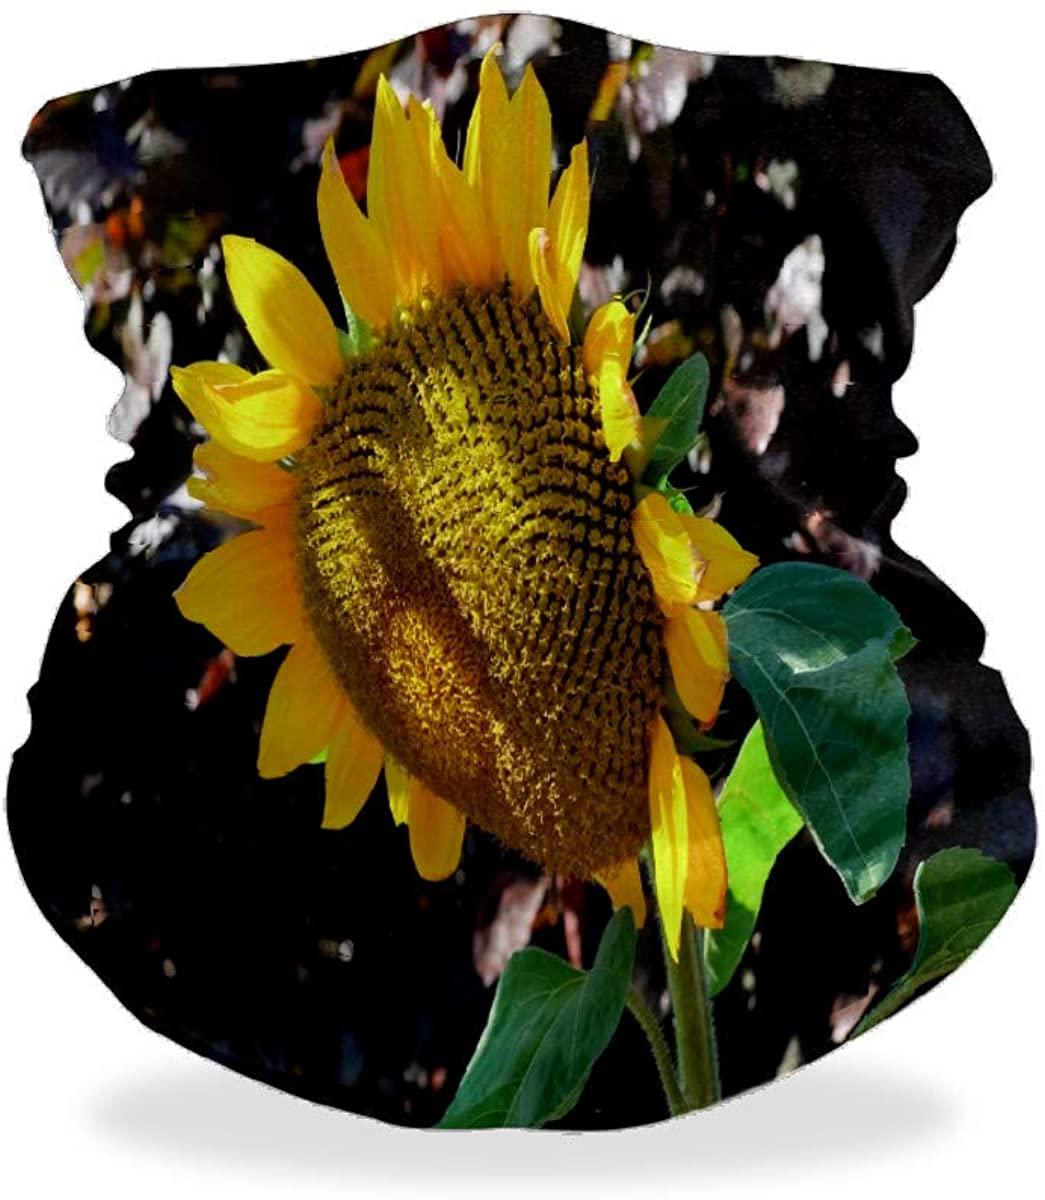 Sunflower Bloom Late Summer Unisex Mouth Mask Bandanas Face Fover Nose Scarf Mask Balaclavas Headbands Hairband Neck Gaiter for Running Shopping Walking Motorcycling Sports Against UV Light Mask